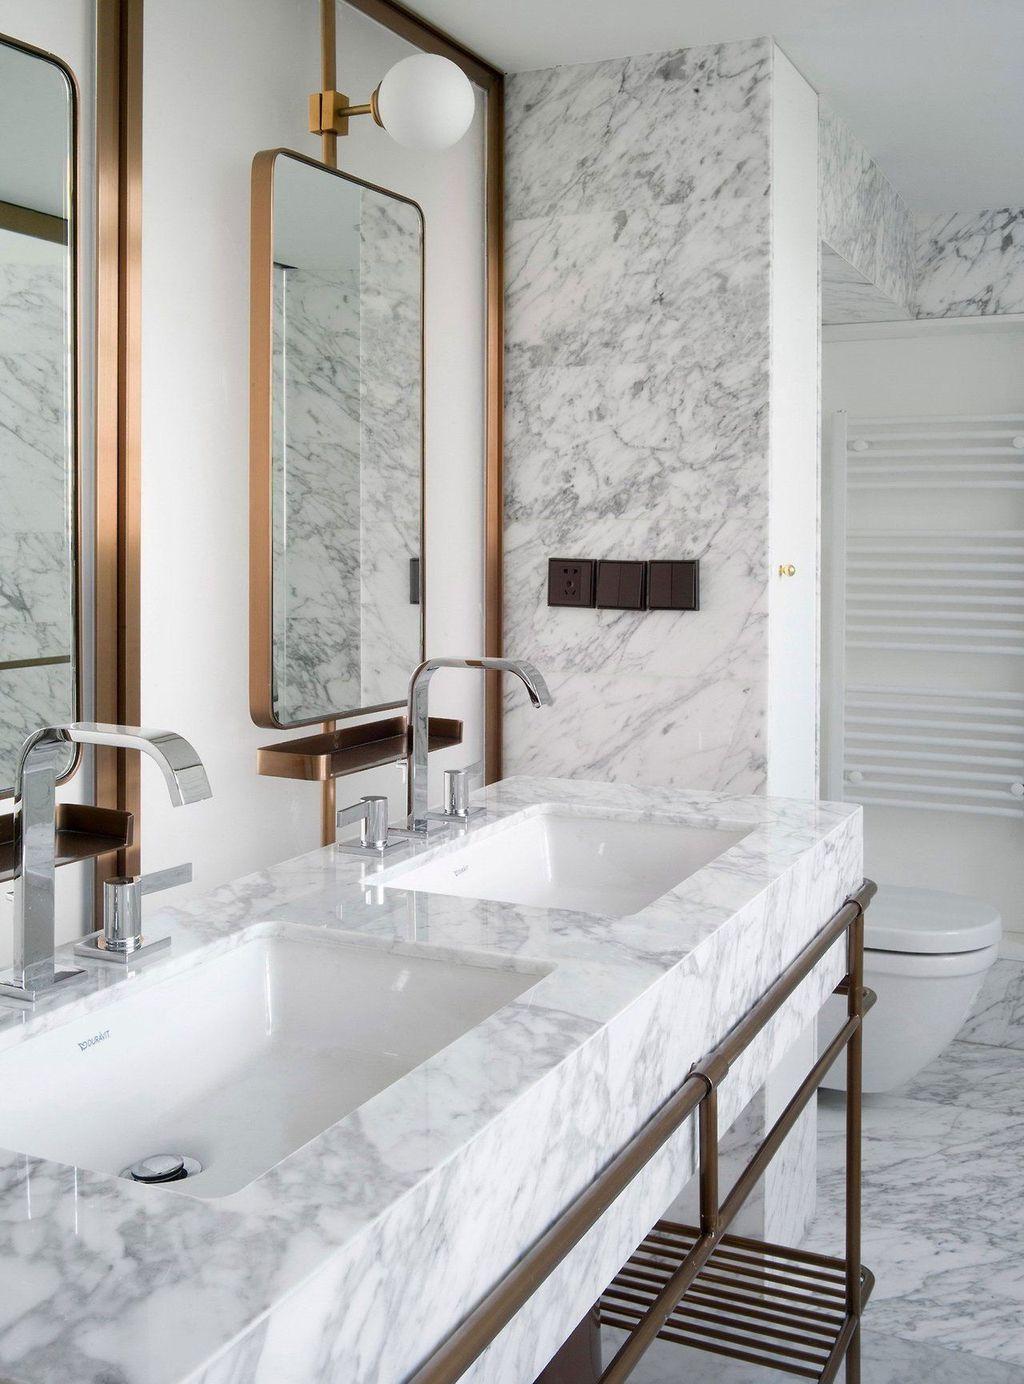 Unusual Bathroom Design Ideas You Need To Know 27